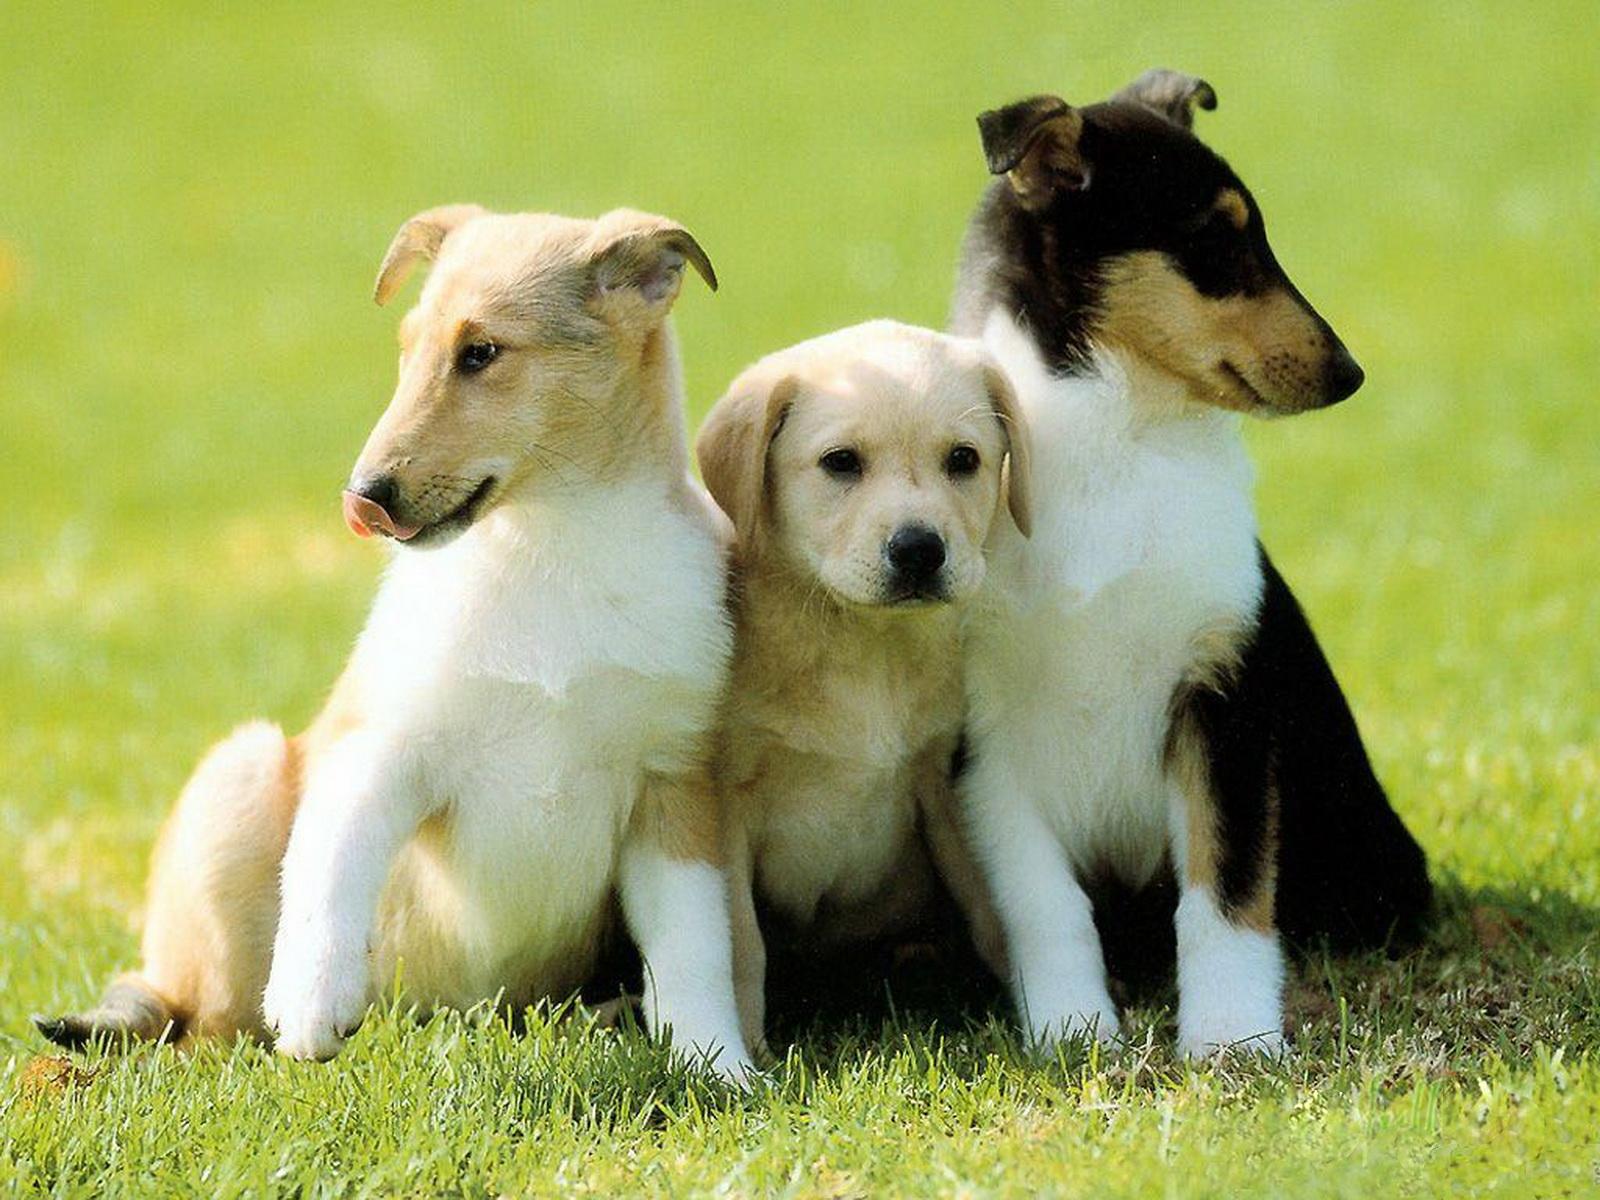 http://4.bp.blogspot.com/-GB-38IhHyiI/Tyw8pCgMDzI/AAAAAAAAA28/oGpHTduTq2I/s1600/19-Cute+Dog+1600x1200.jpg